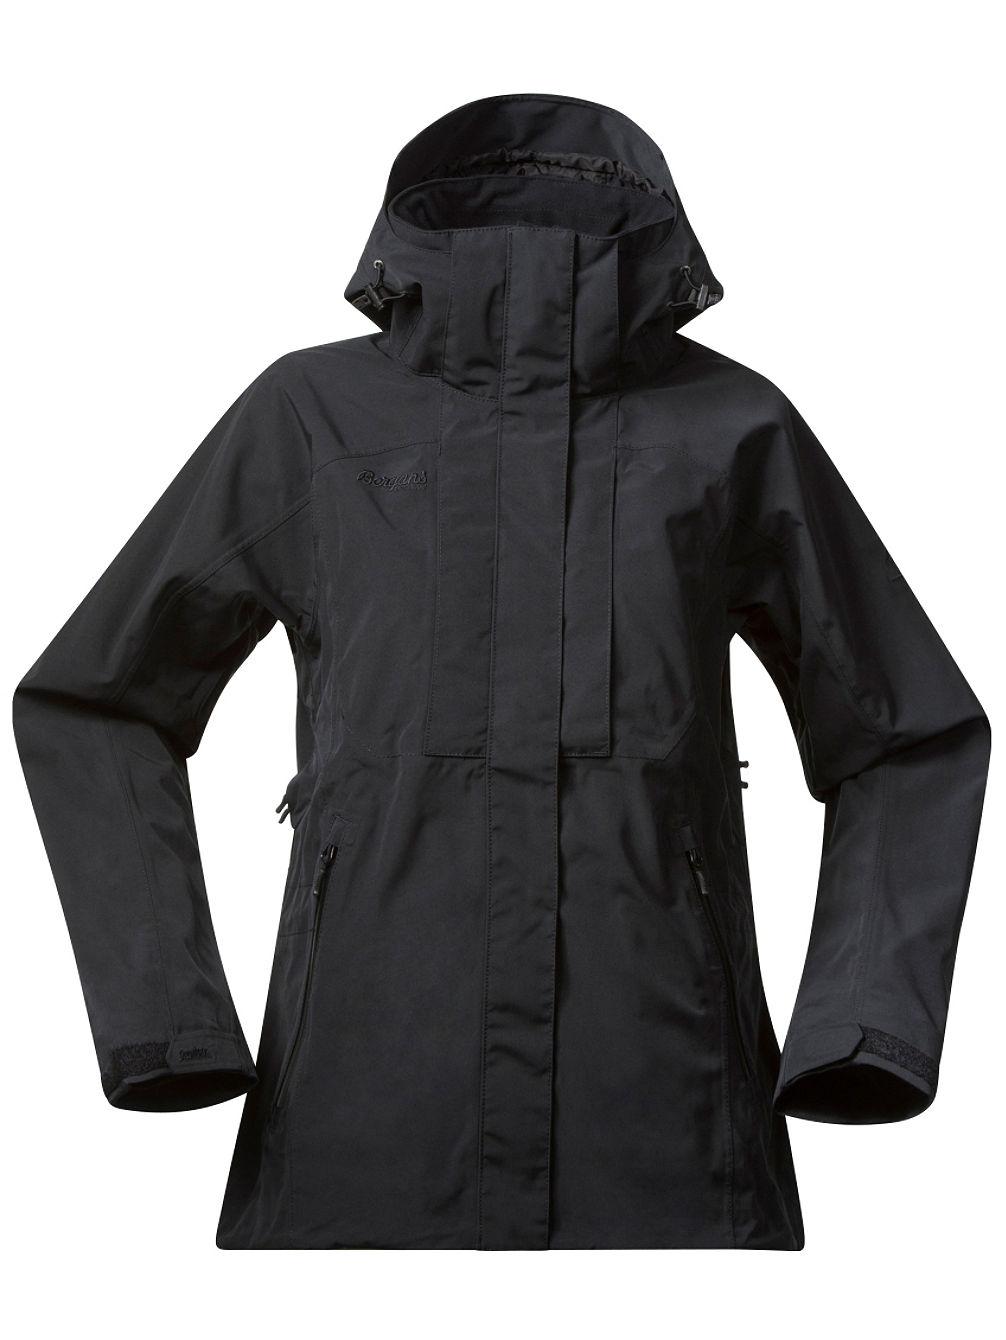 3d45ae24 Køb Bergans Breheimen Outdoor Jacket online hos Blue Tomato